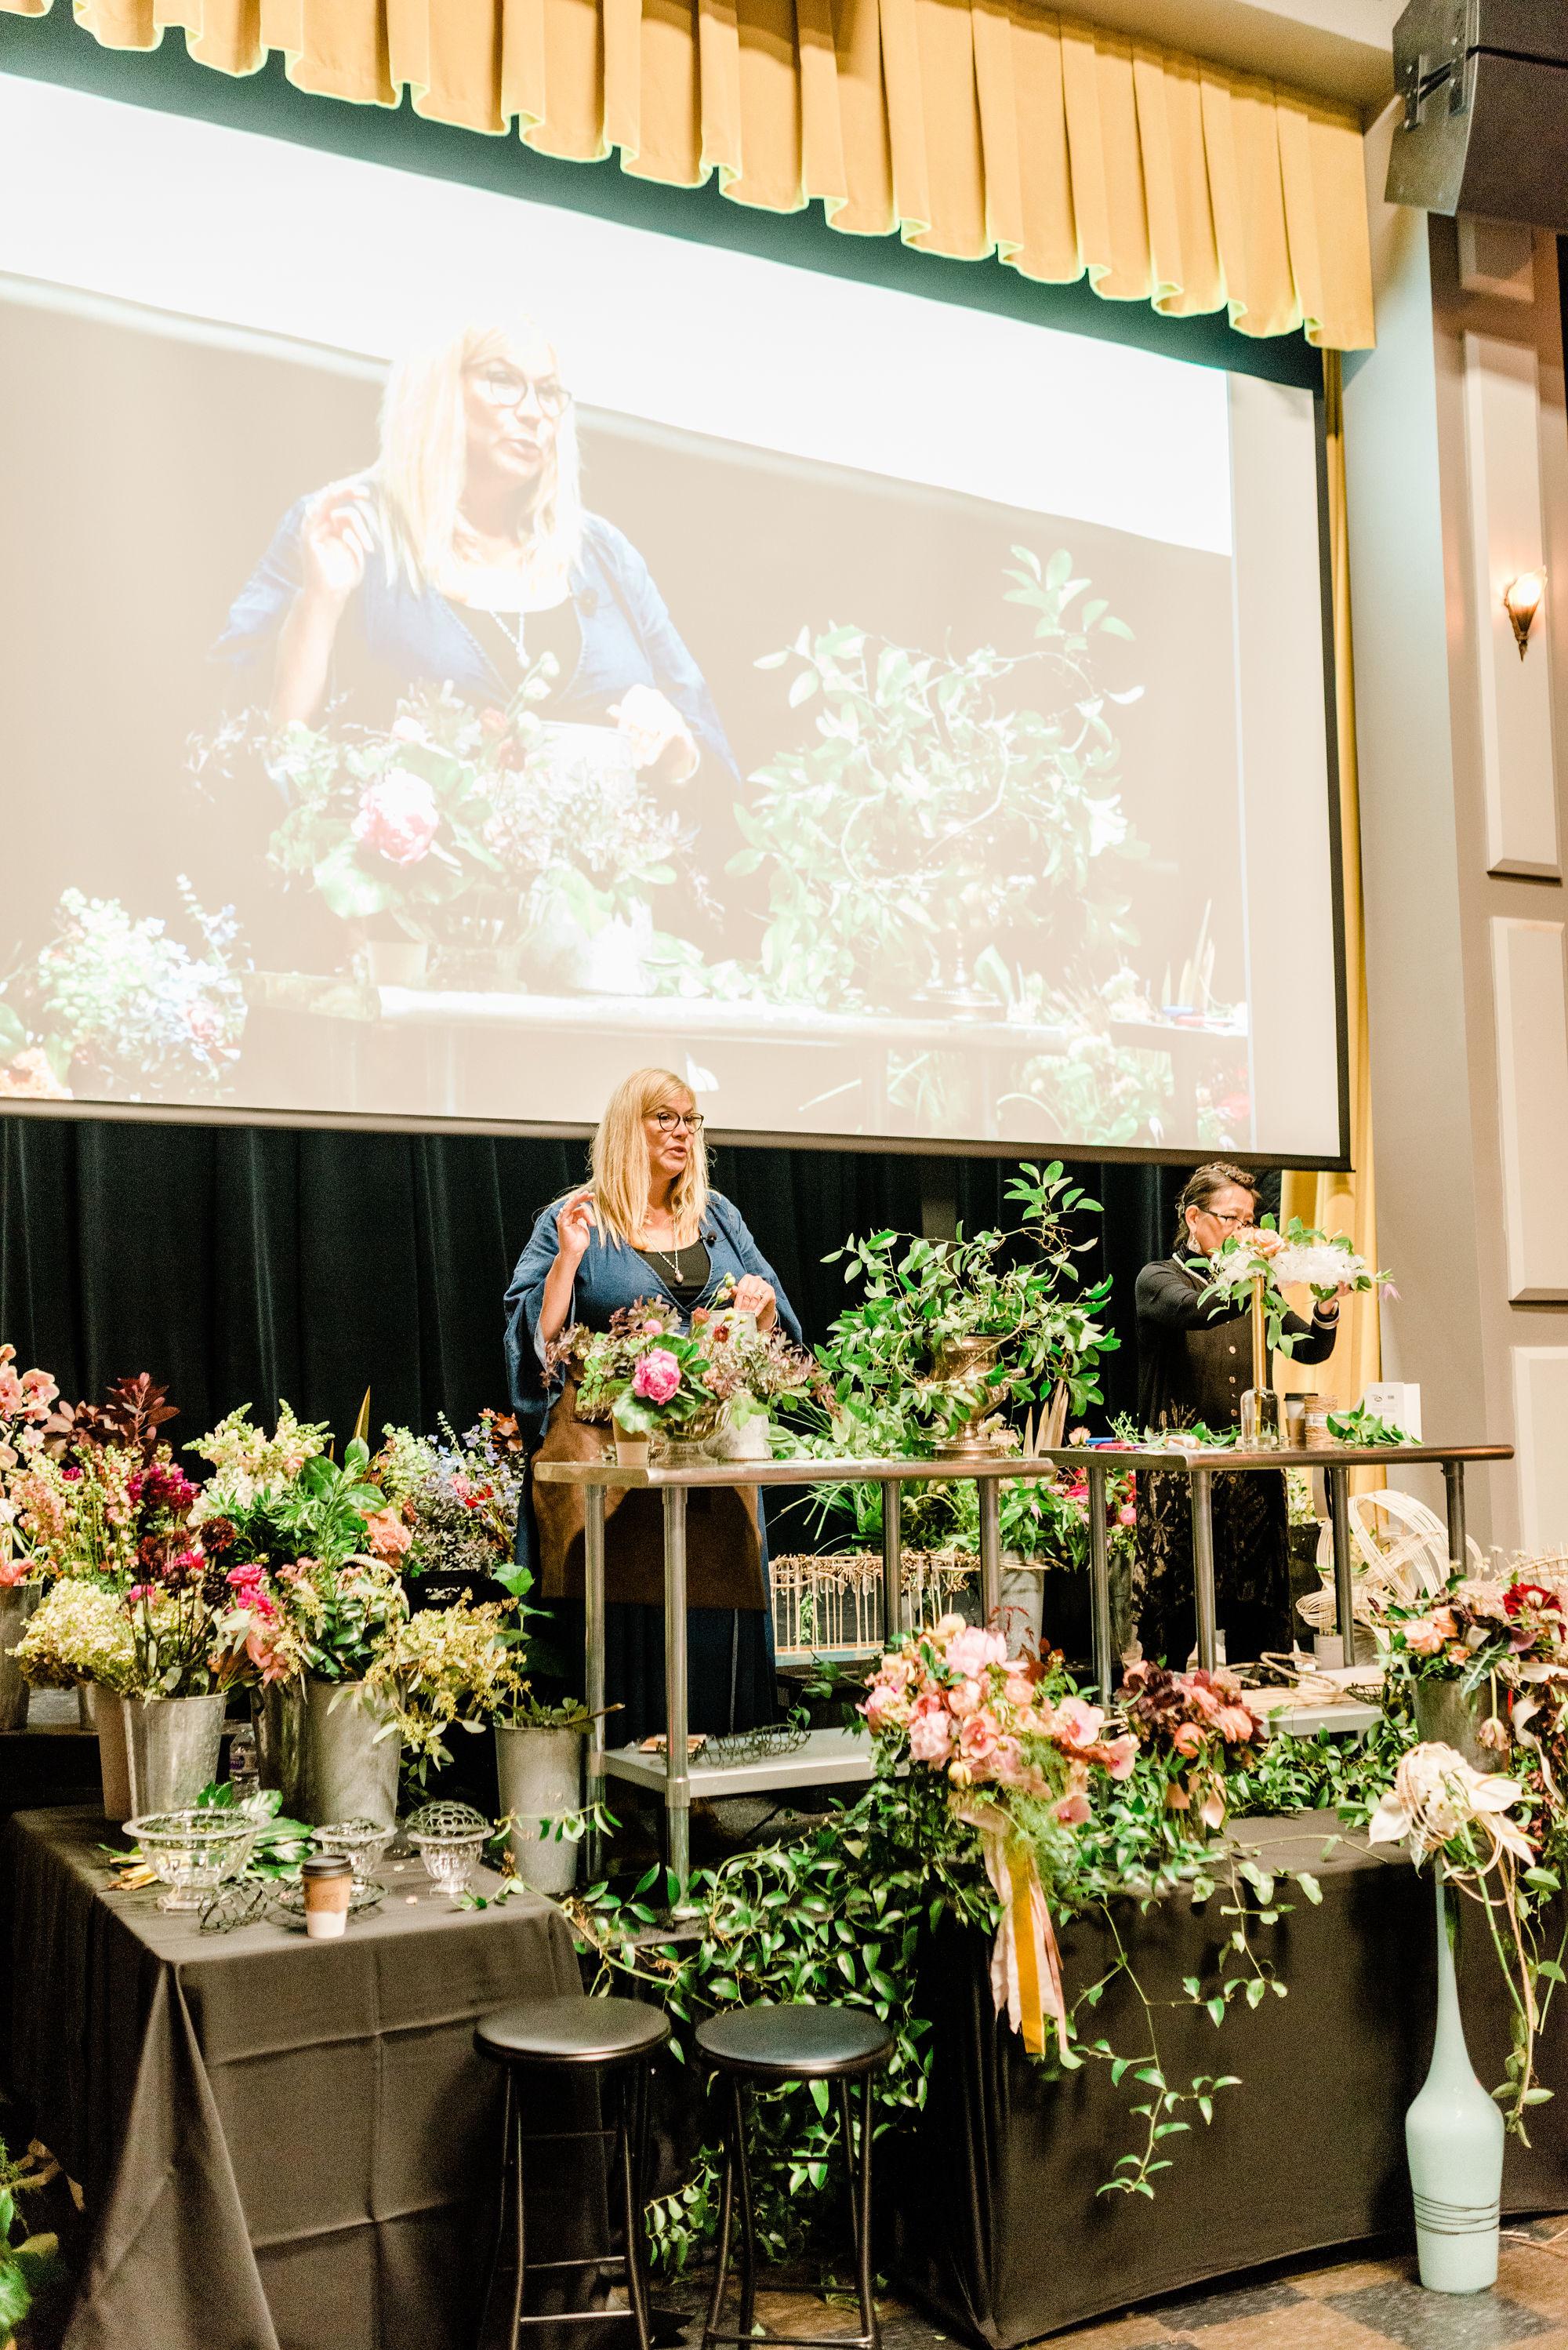 Ten23-Photography-Botanical-Brouhaha-Workshop-18.jpg